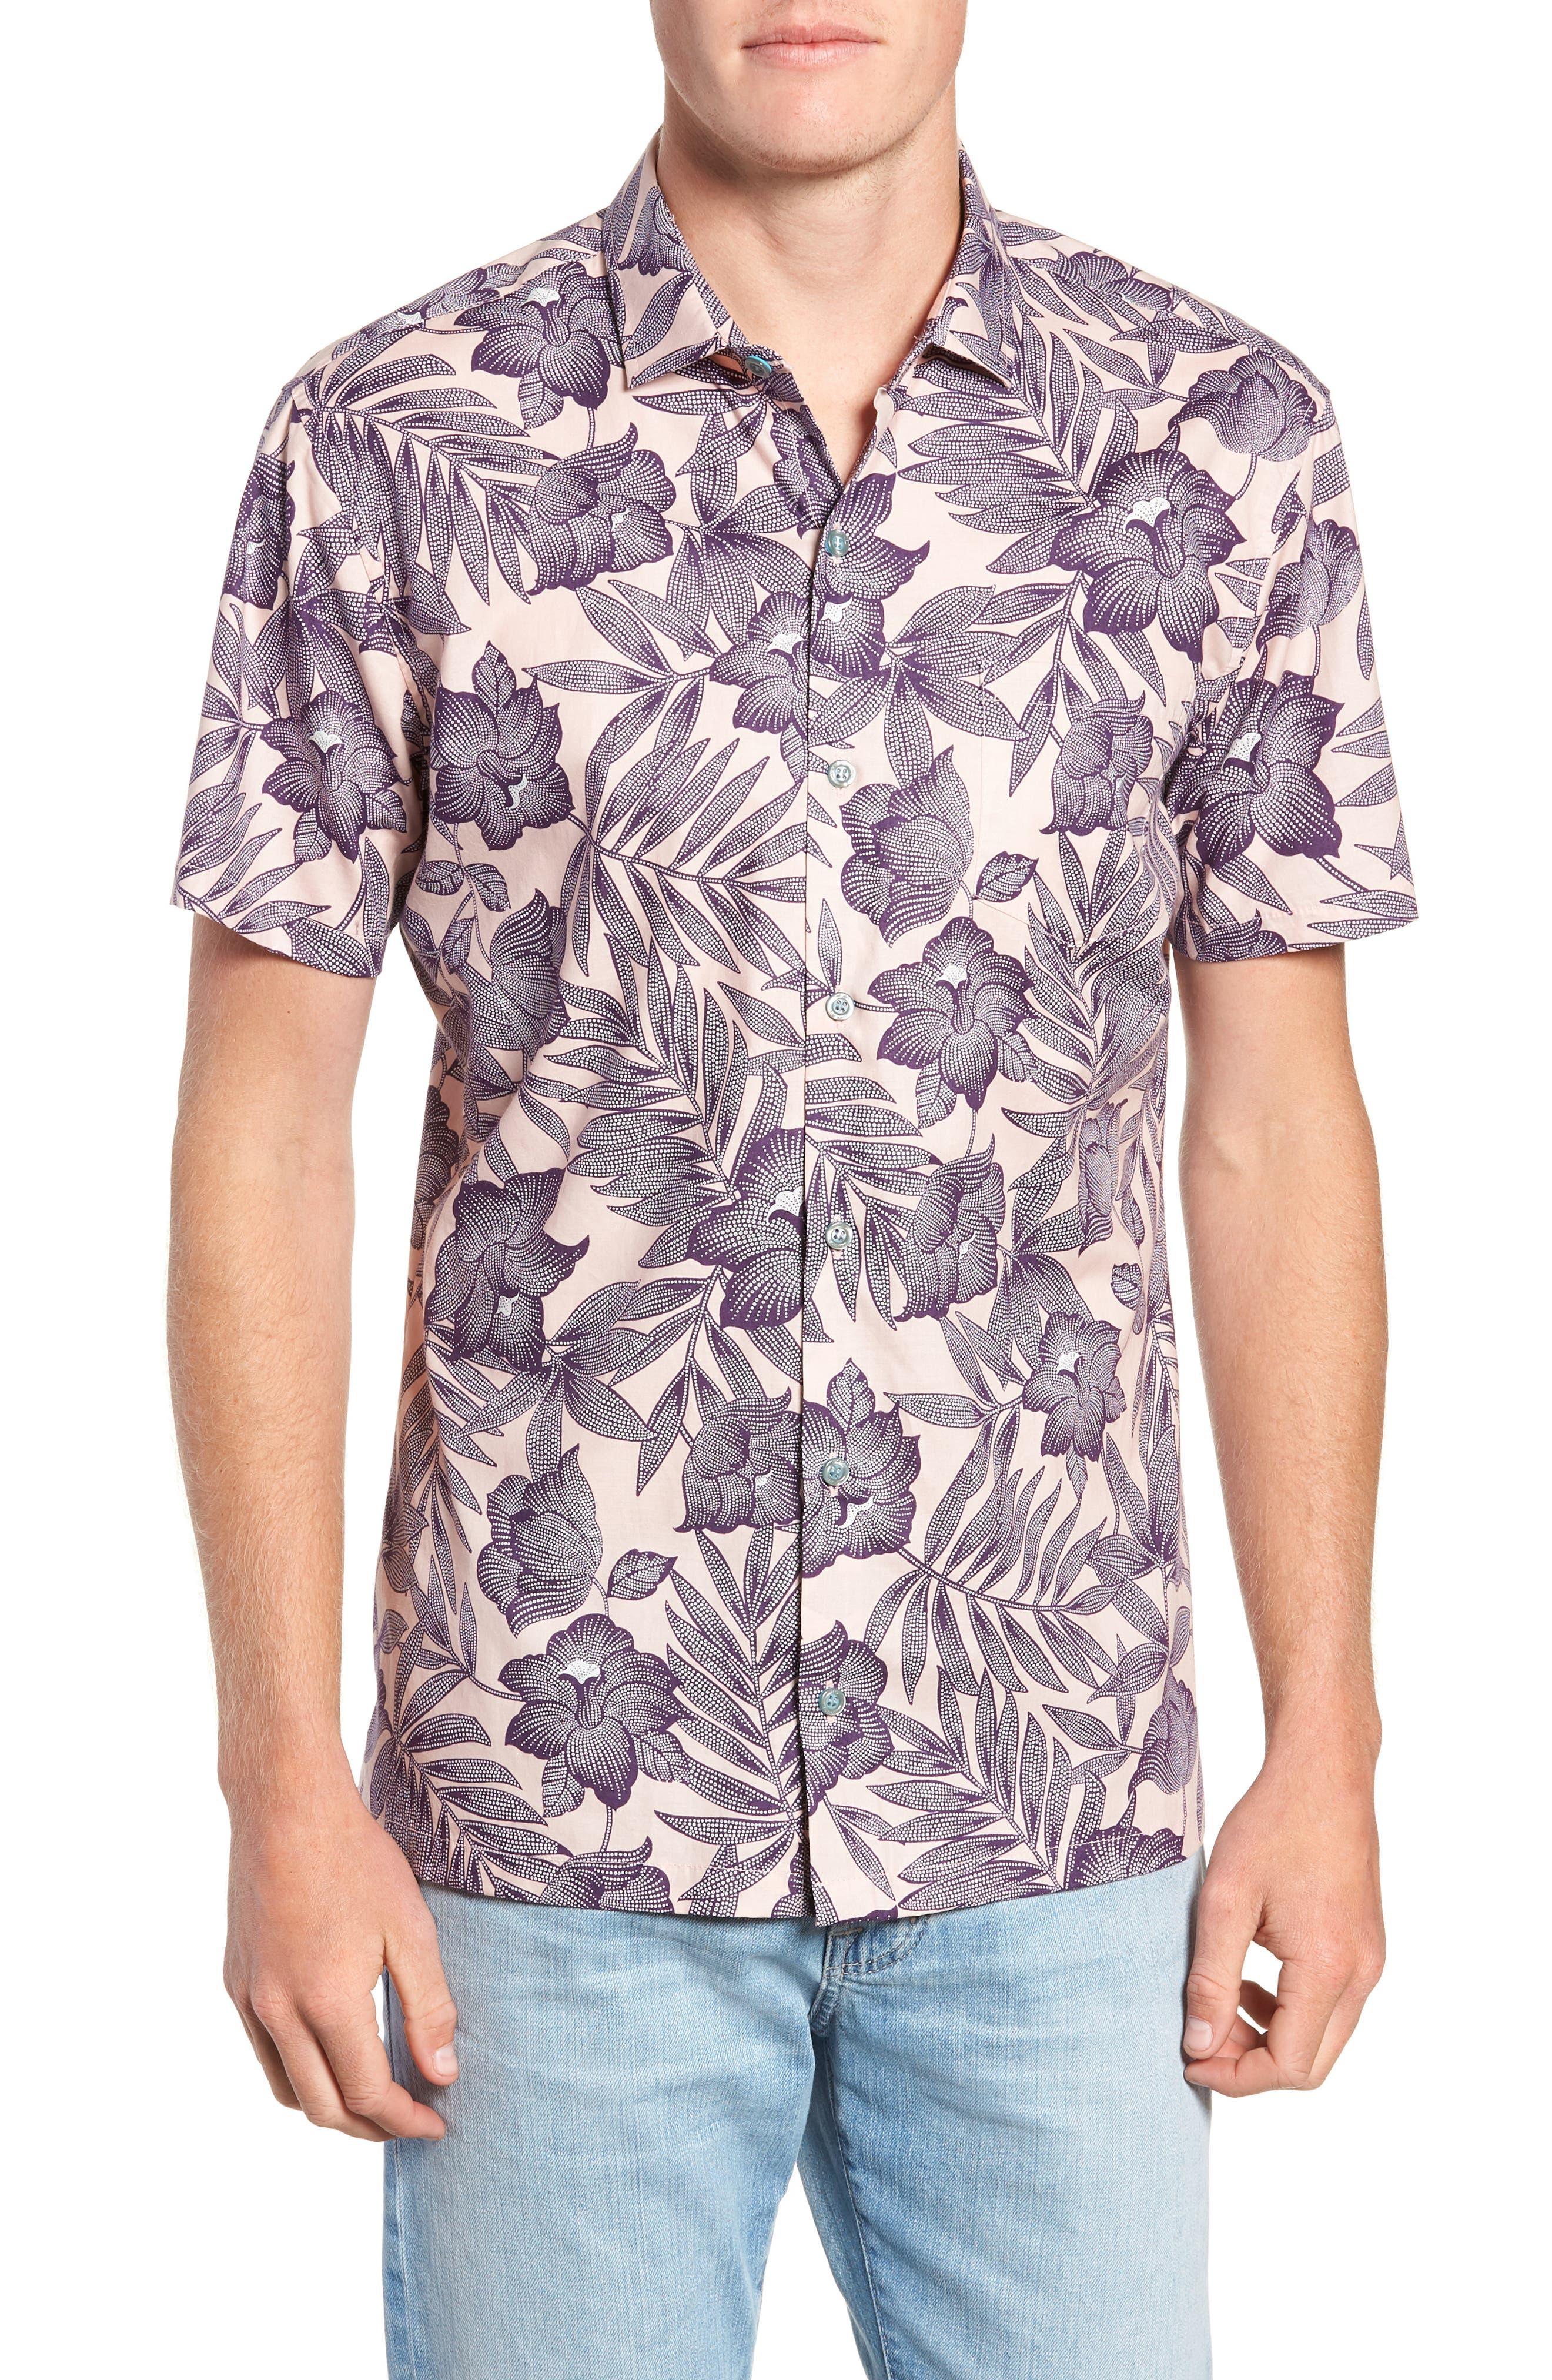 TORI RICHARD Pollenesia Regular Fit Sport Shirt, Main, color, PINK